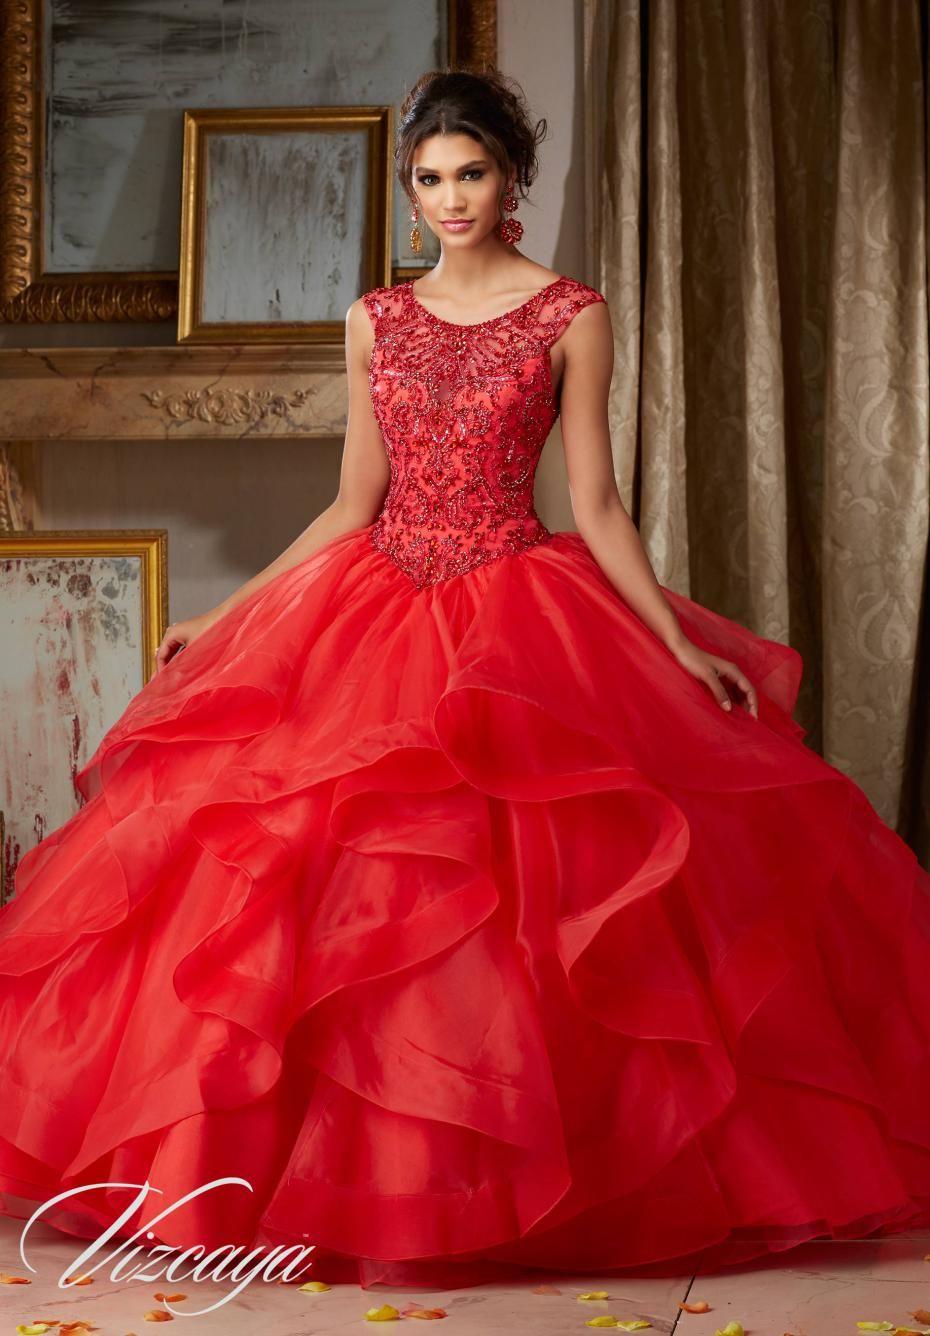 Royal Blue Long Ball Gown Beaded Quinceanera Dresses Organza Masquerade Backless Sexy Red Vestido De Debutante